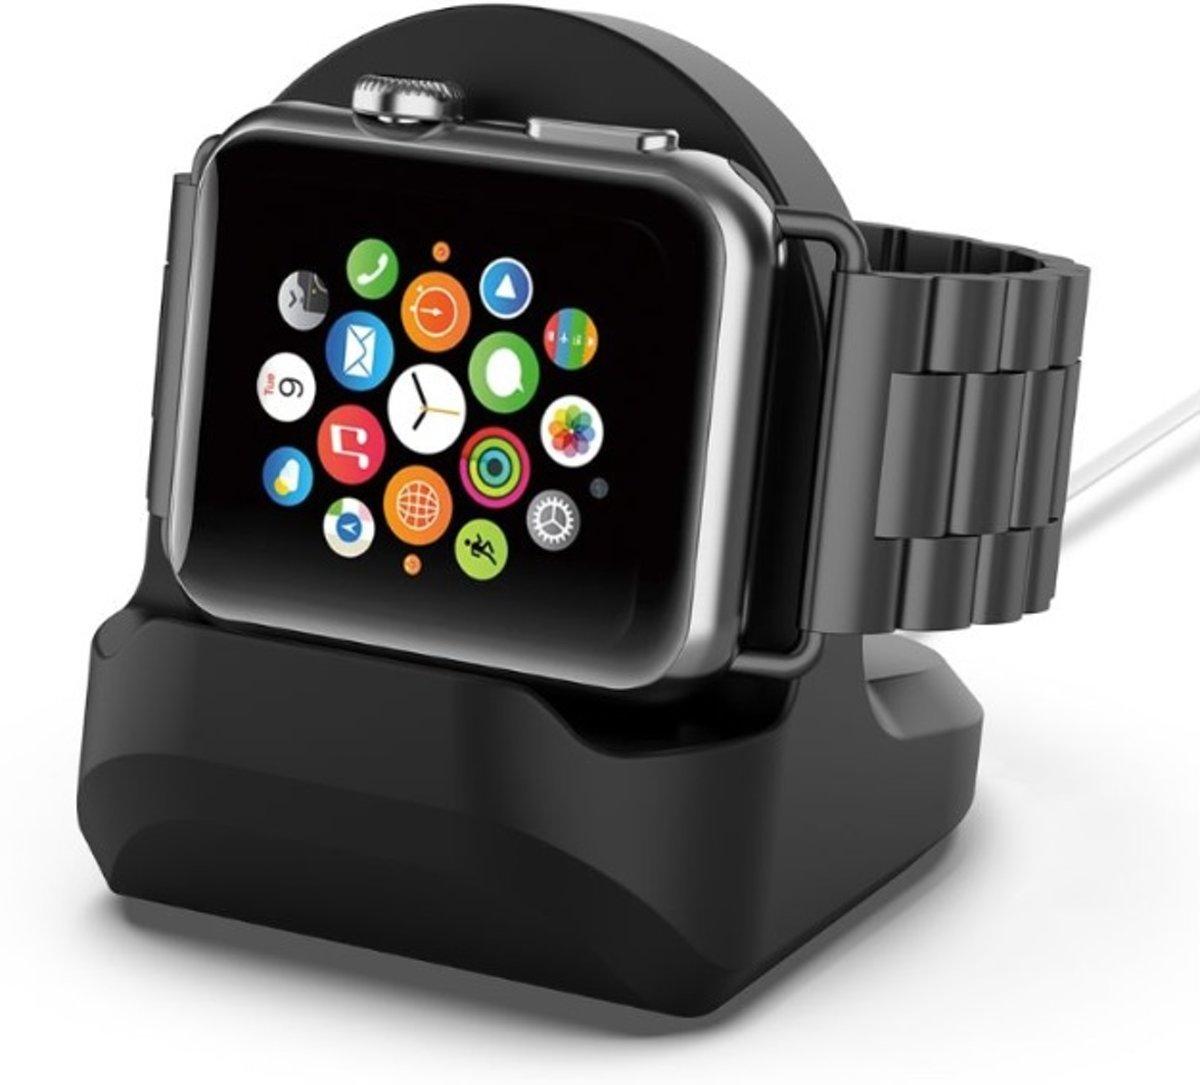 Apple Watch - Docking station - Houder - Tafelhouder - Universeel alle modellen - ZWART kopen